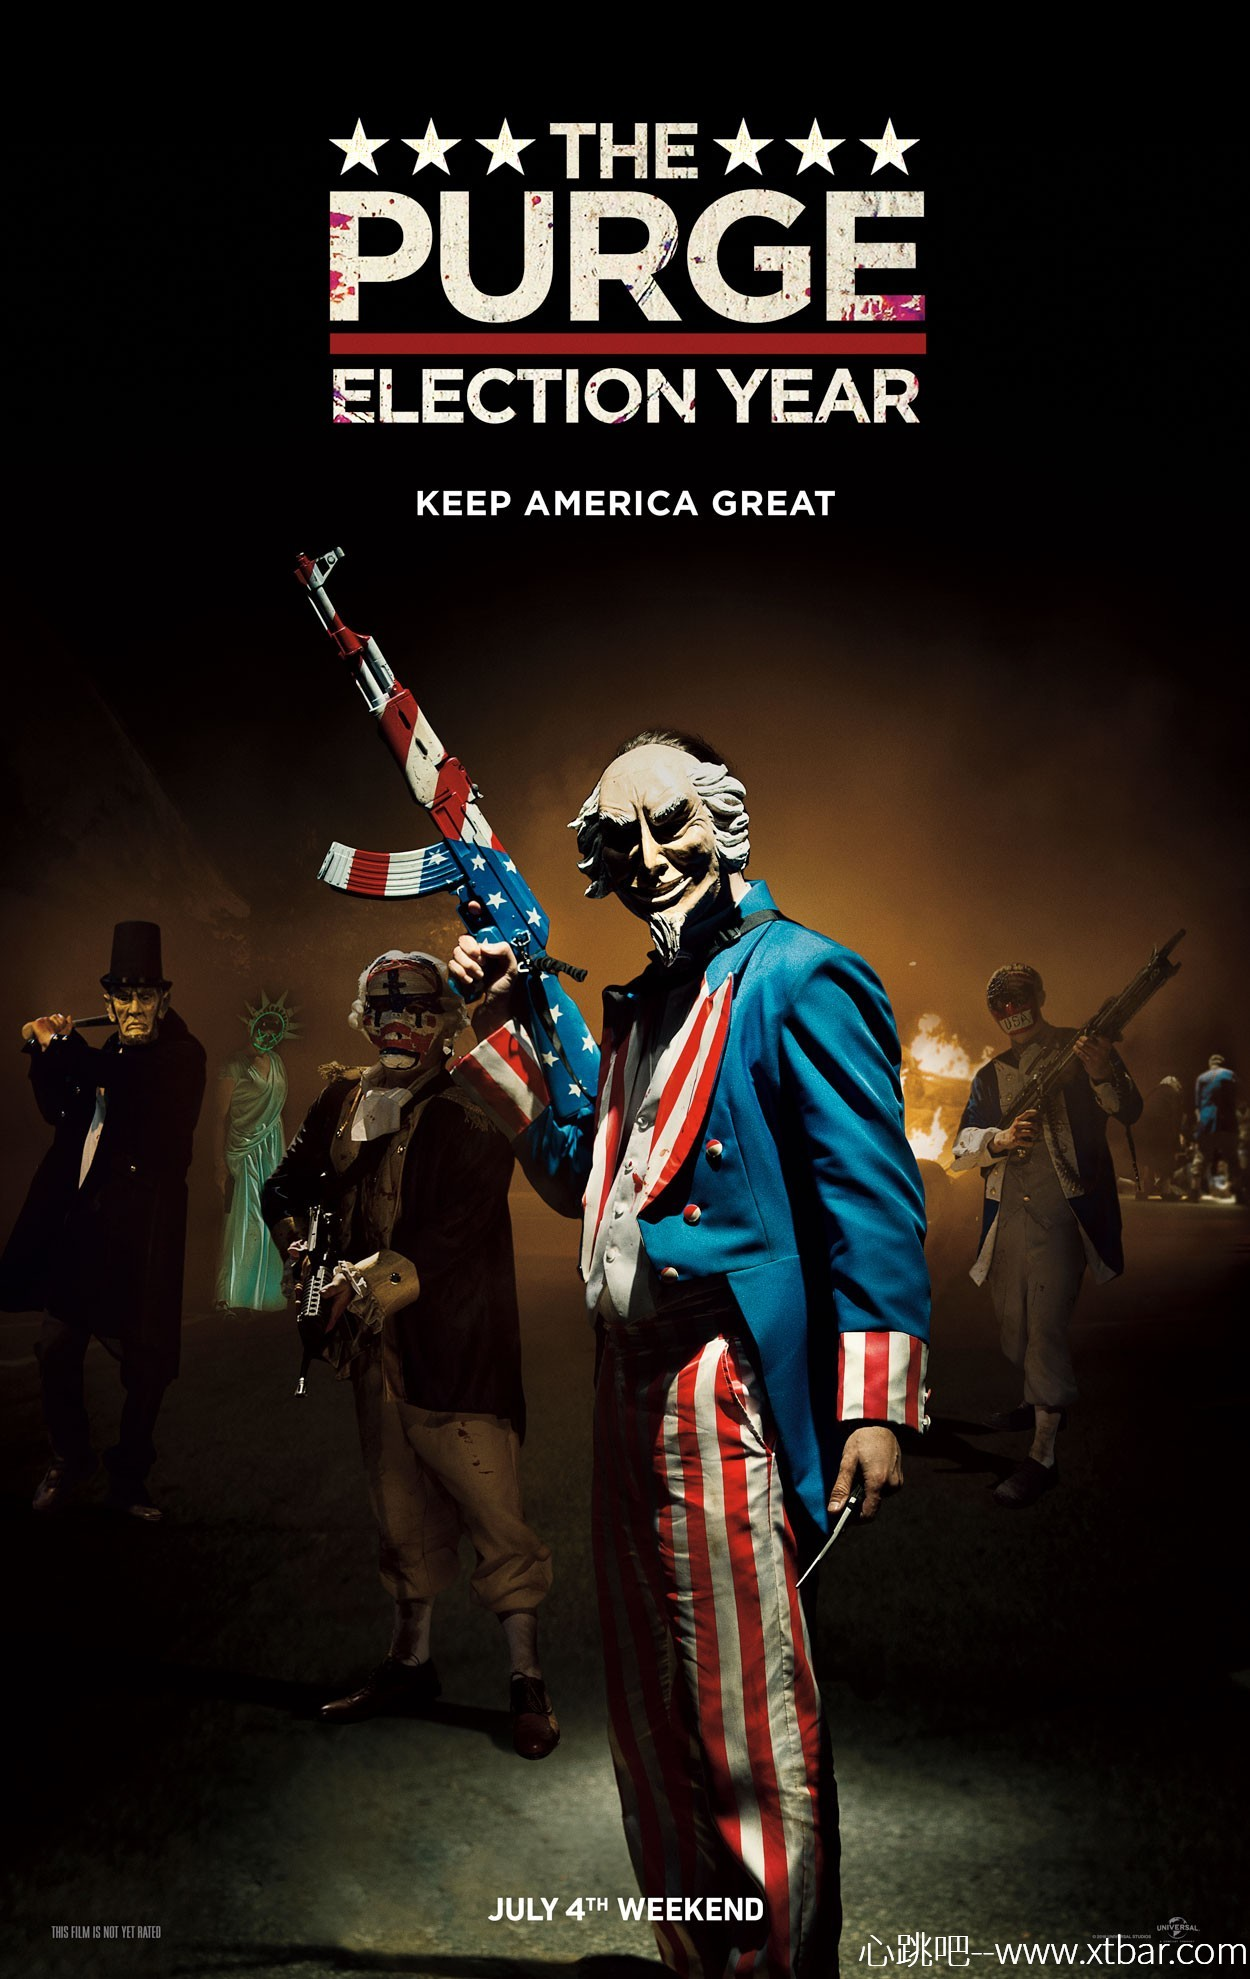 0085j6oIly1gm8faapa8uj30yq1izaiu - [心跳吧恐怖片推荐]:《人类清除计划3:大选之年》,杀人很重要,但节日装扮才是根本!